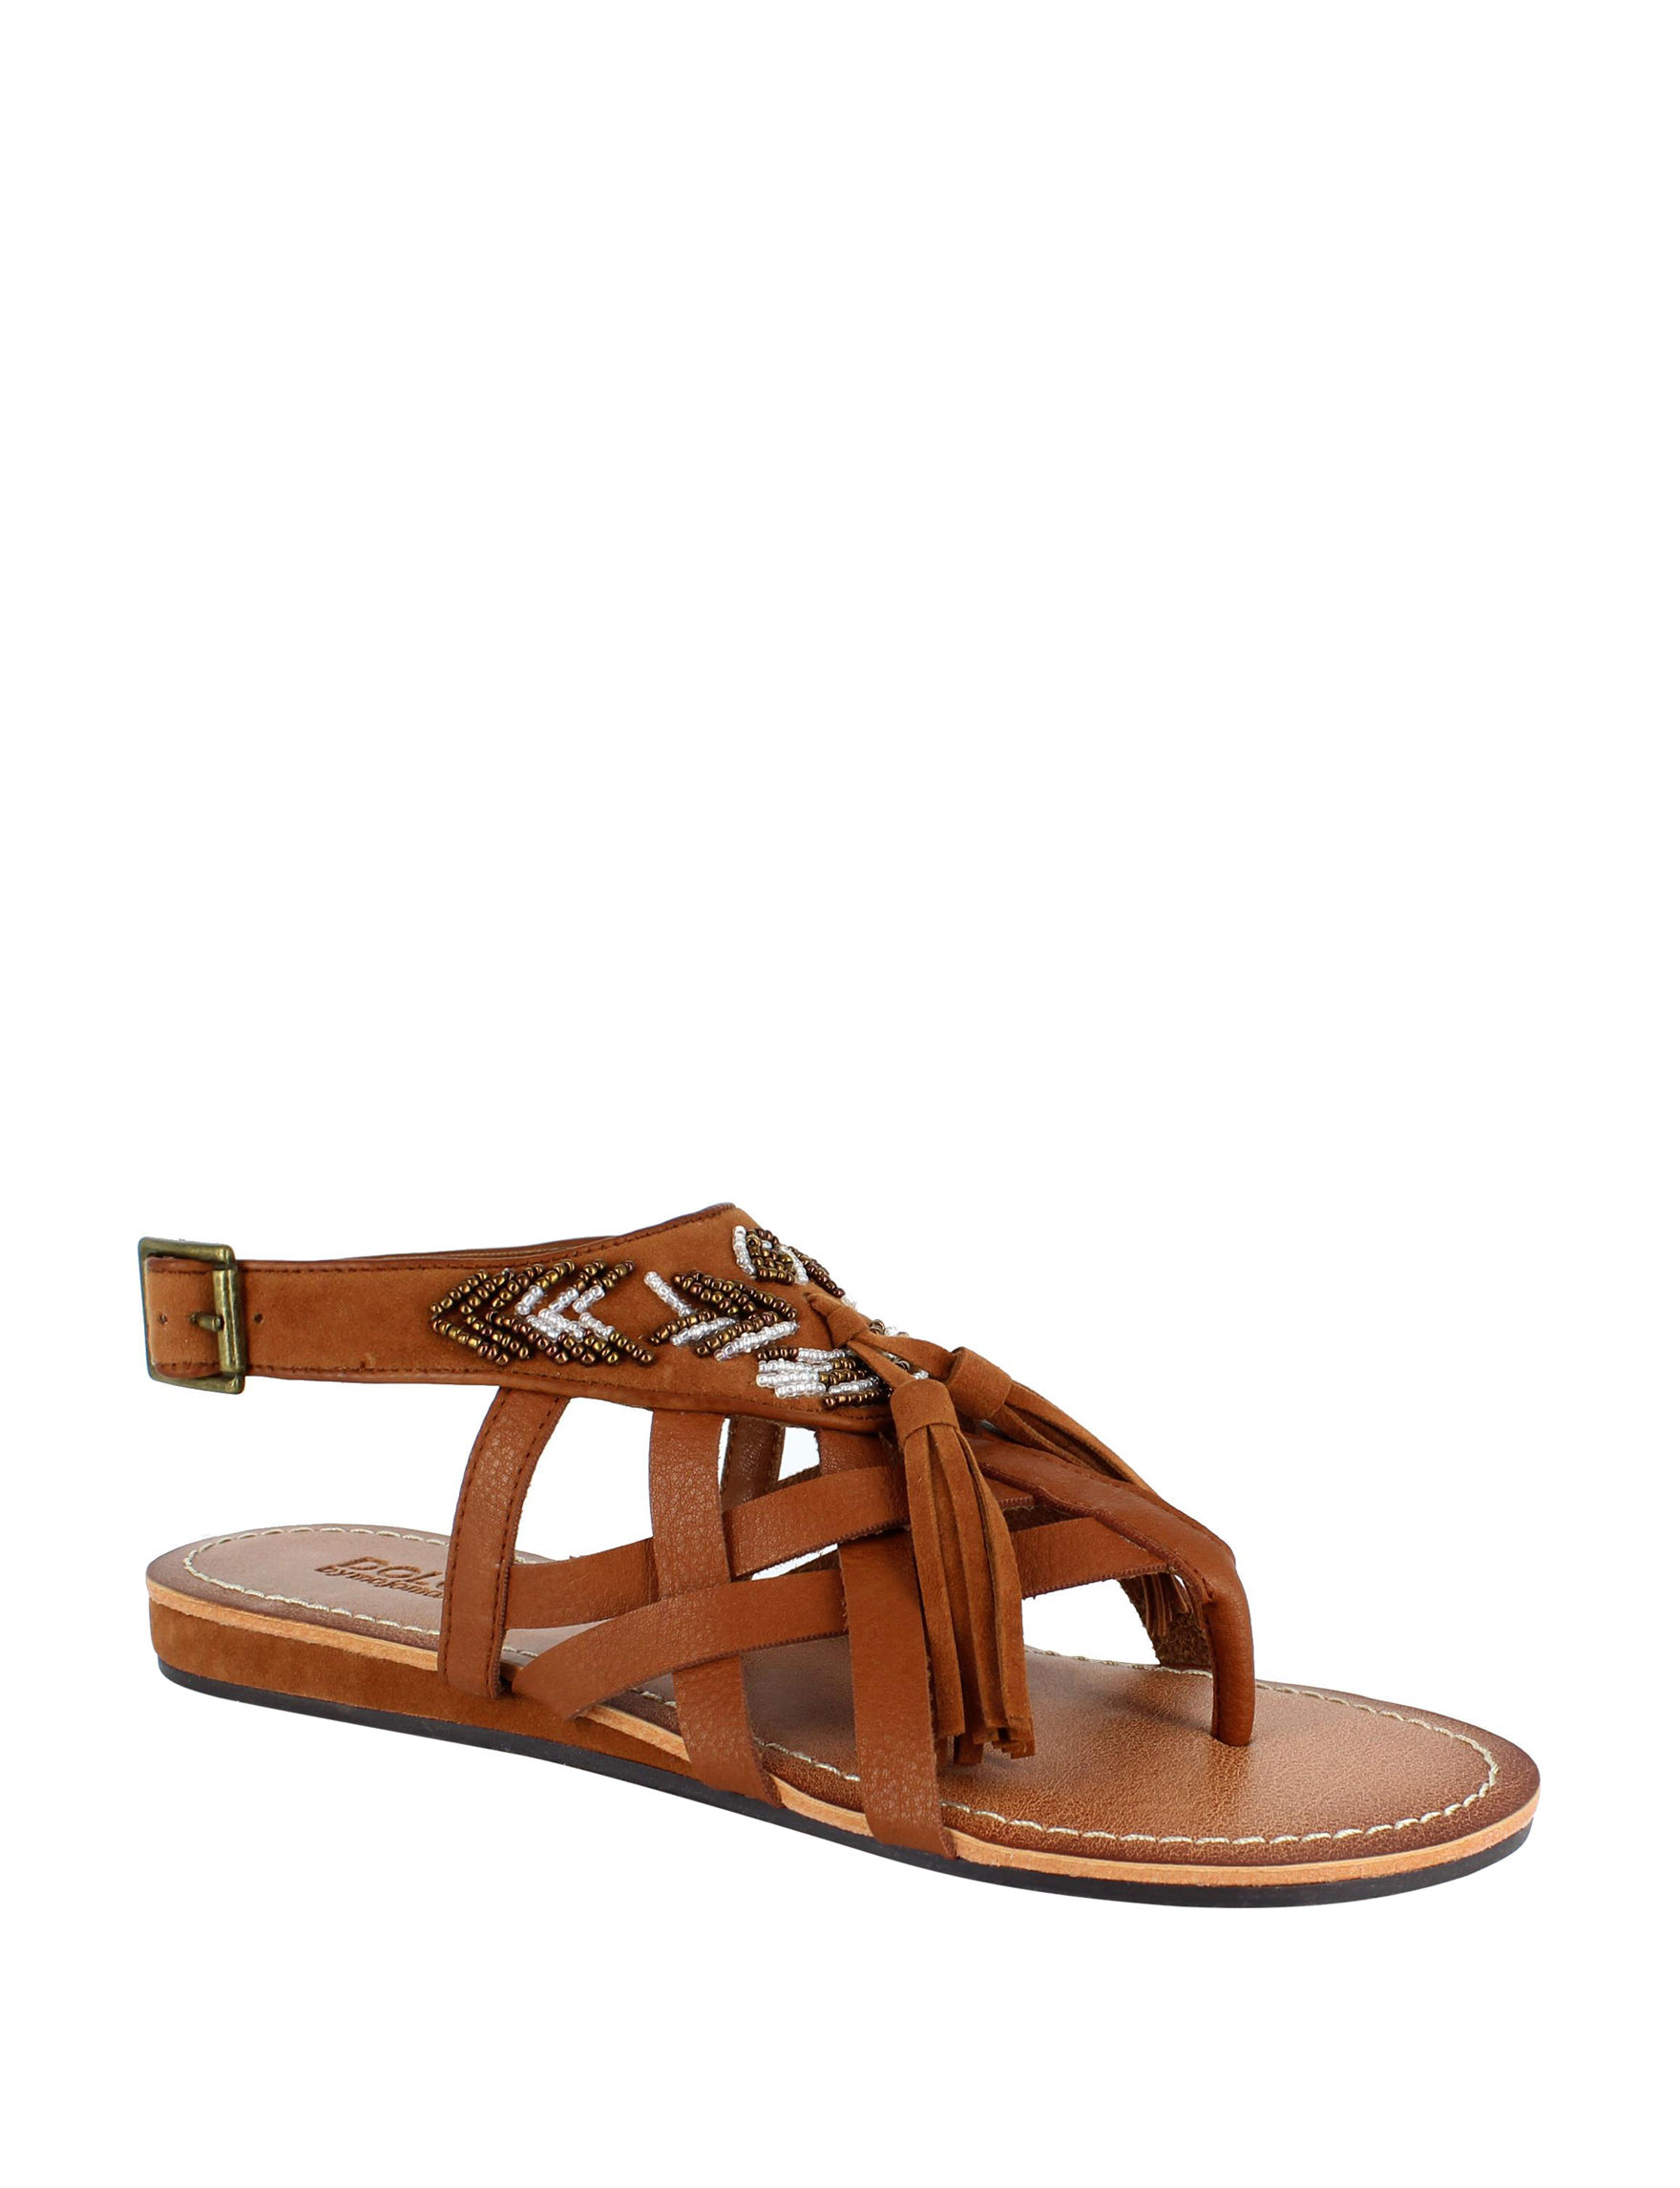 Dolce by Mojo Moxy Tan Flat Sandals Gladiators